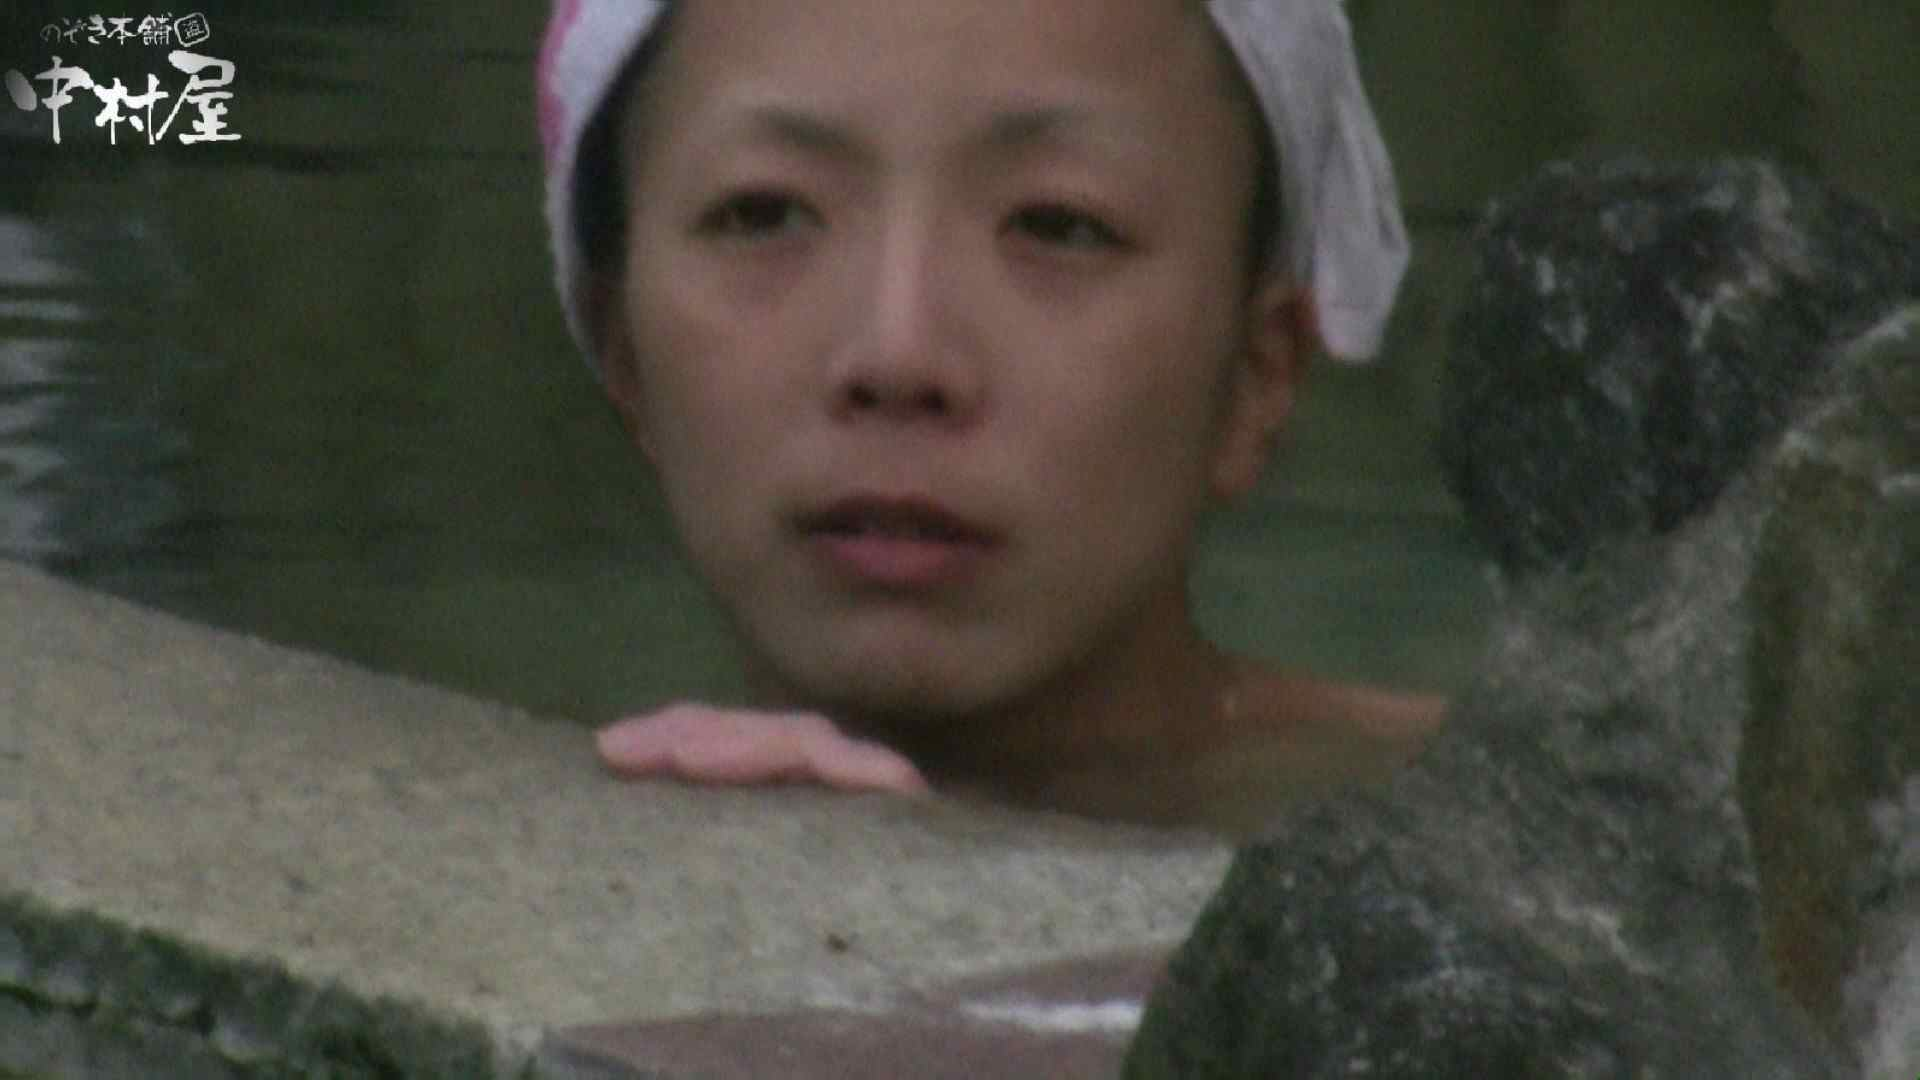 Aquaな露天風呂Vol.929 盗撮シリーズ   露天風呂編  94PIX 93